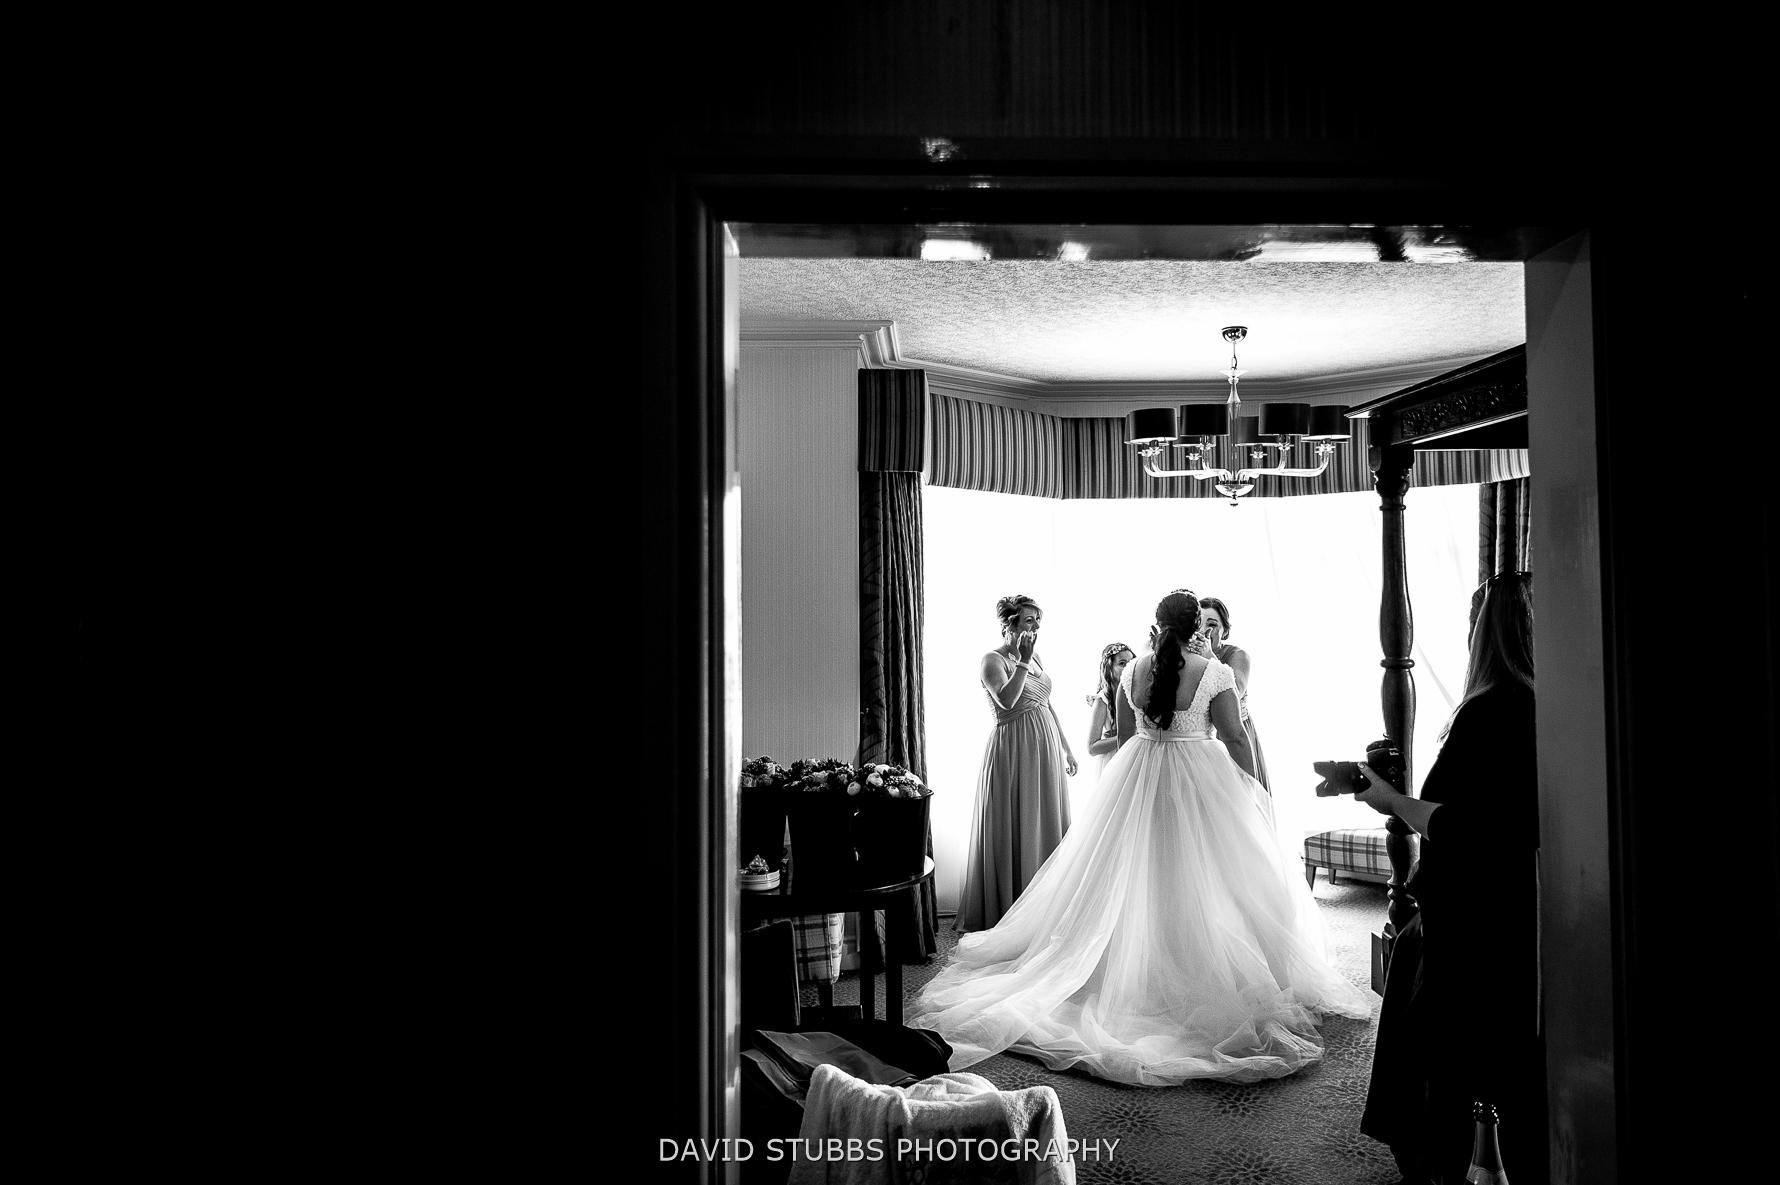 wedding dress looking beautiful